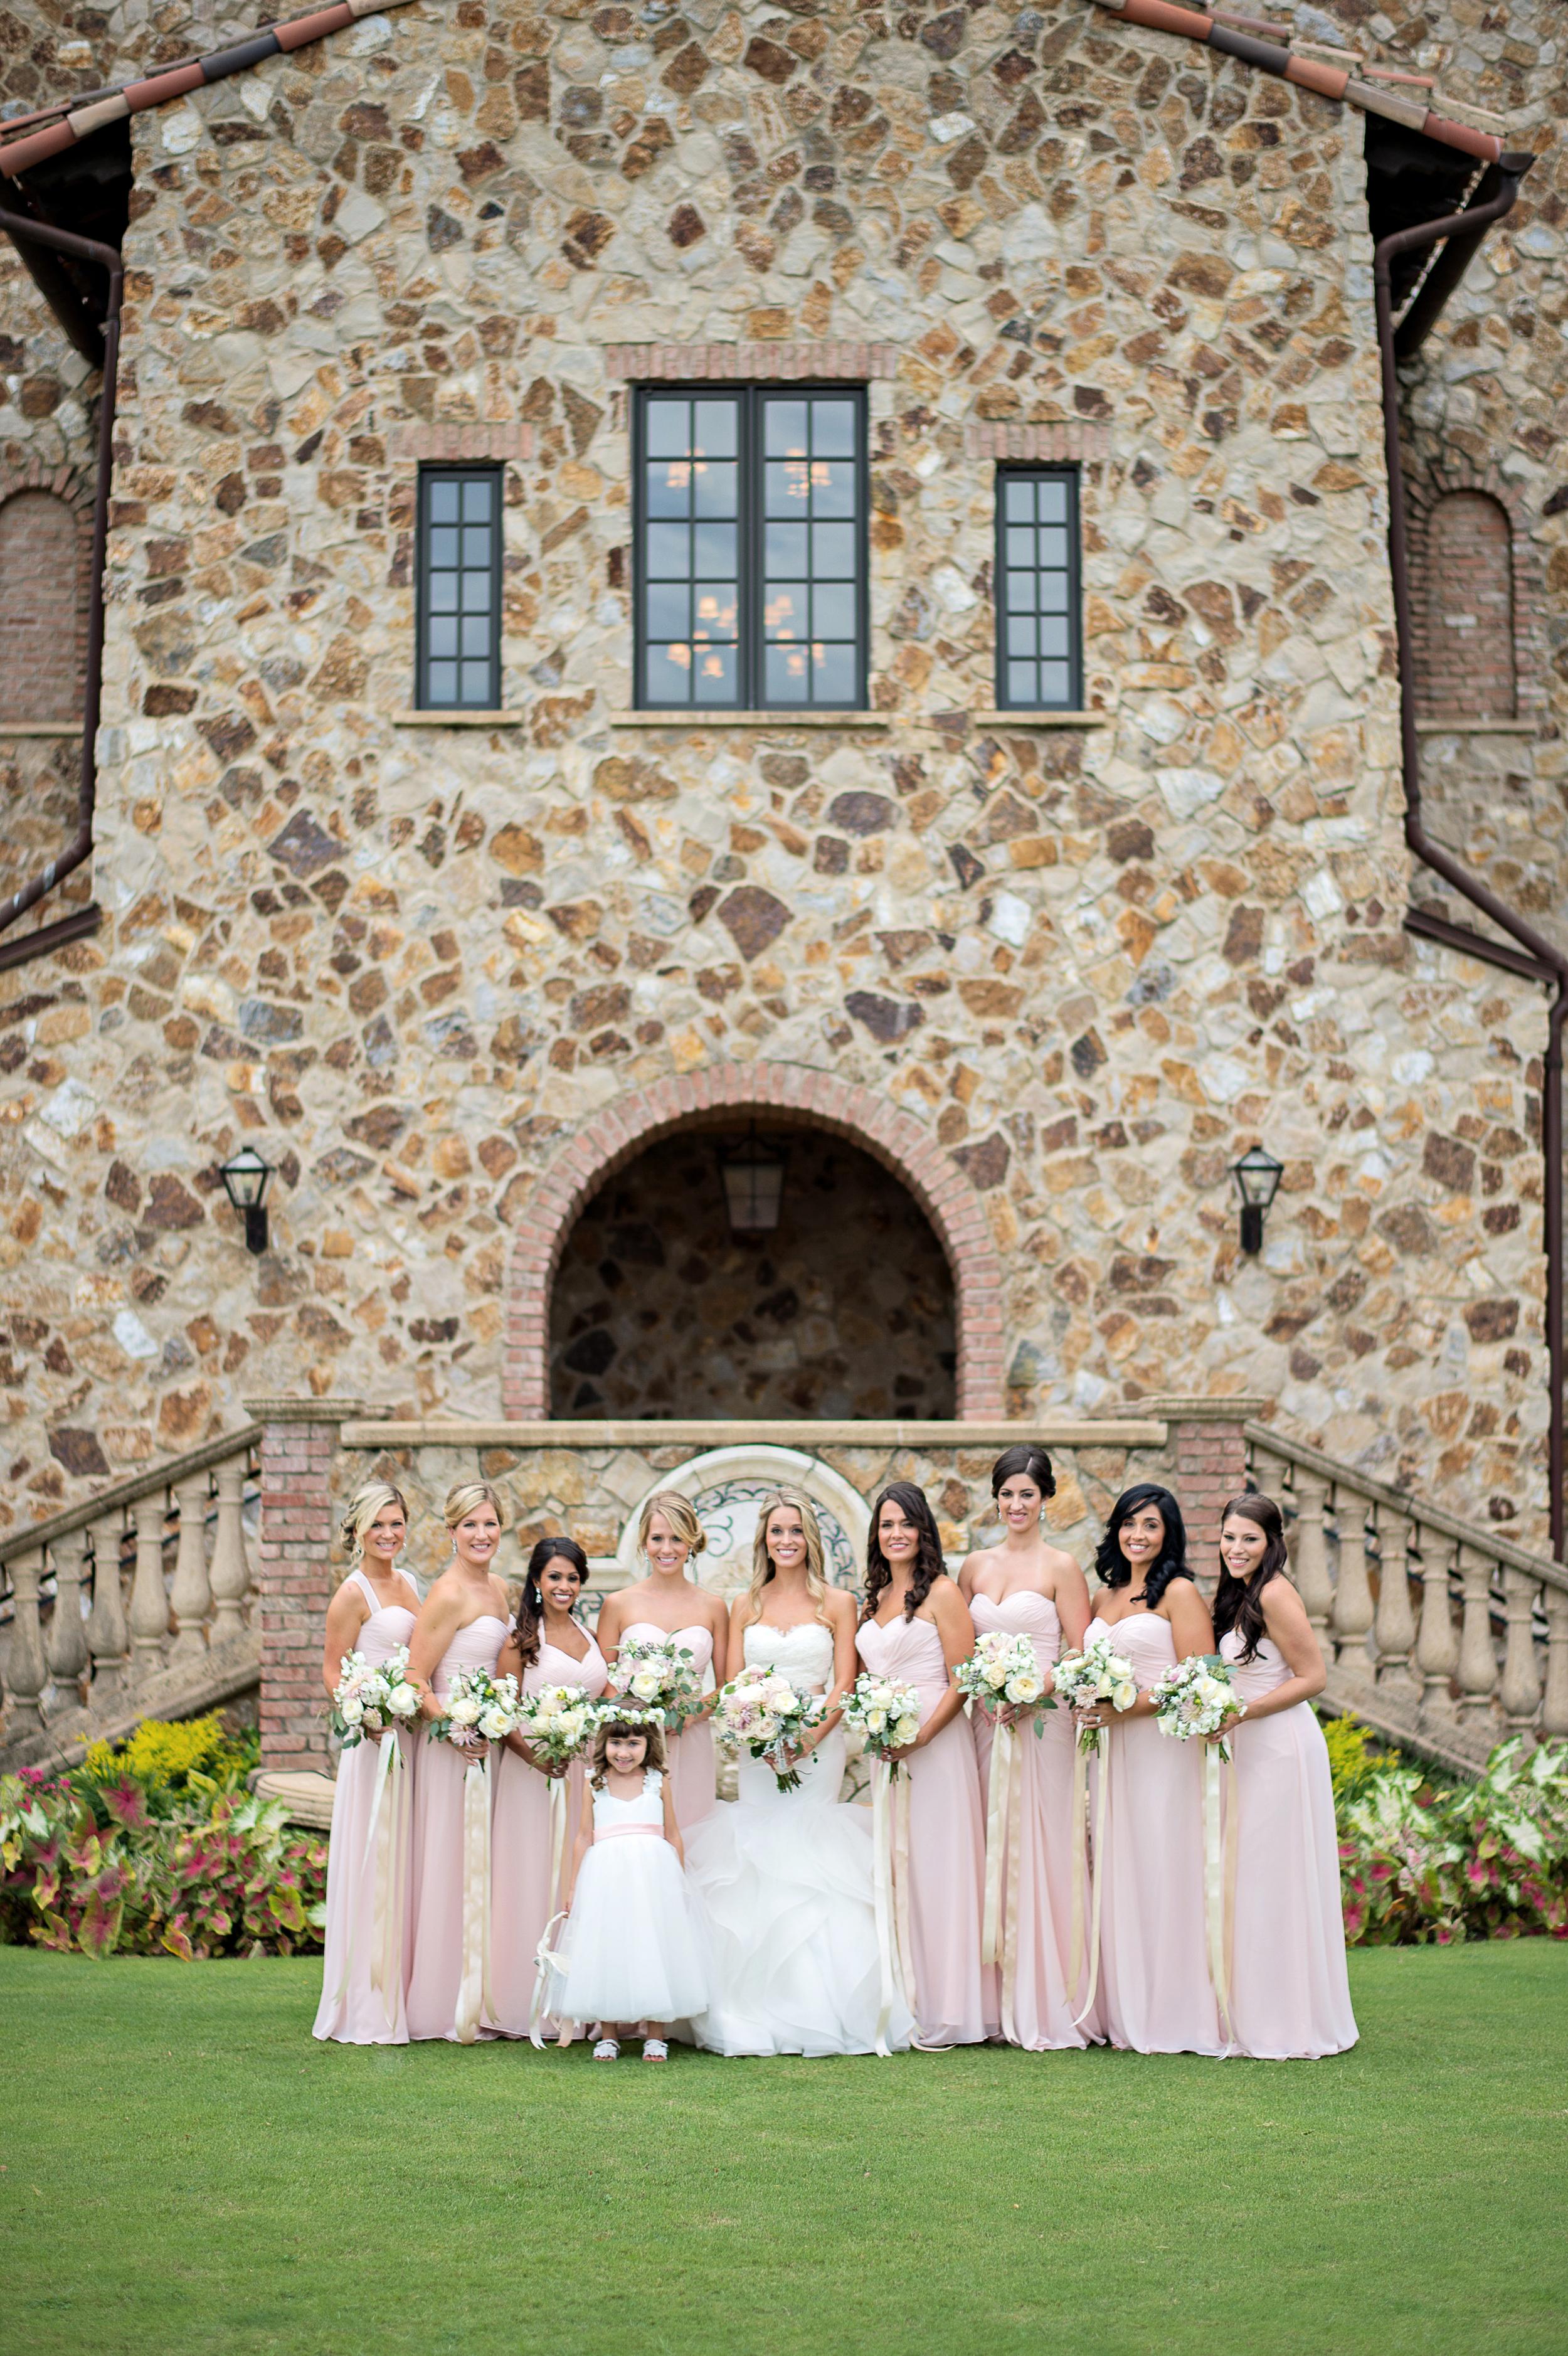 kristenweaver.com   Bella Collina Wedding in Montverde Florida   Kristen Weaver Photography   Destination Wedding Photographer